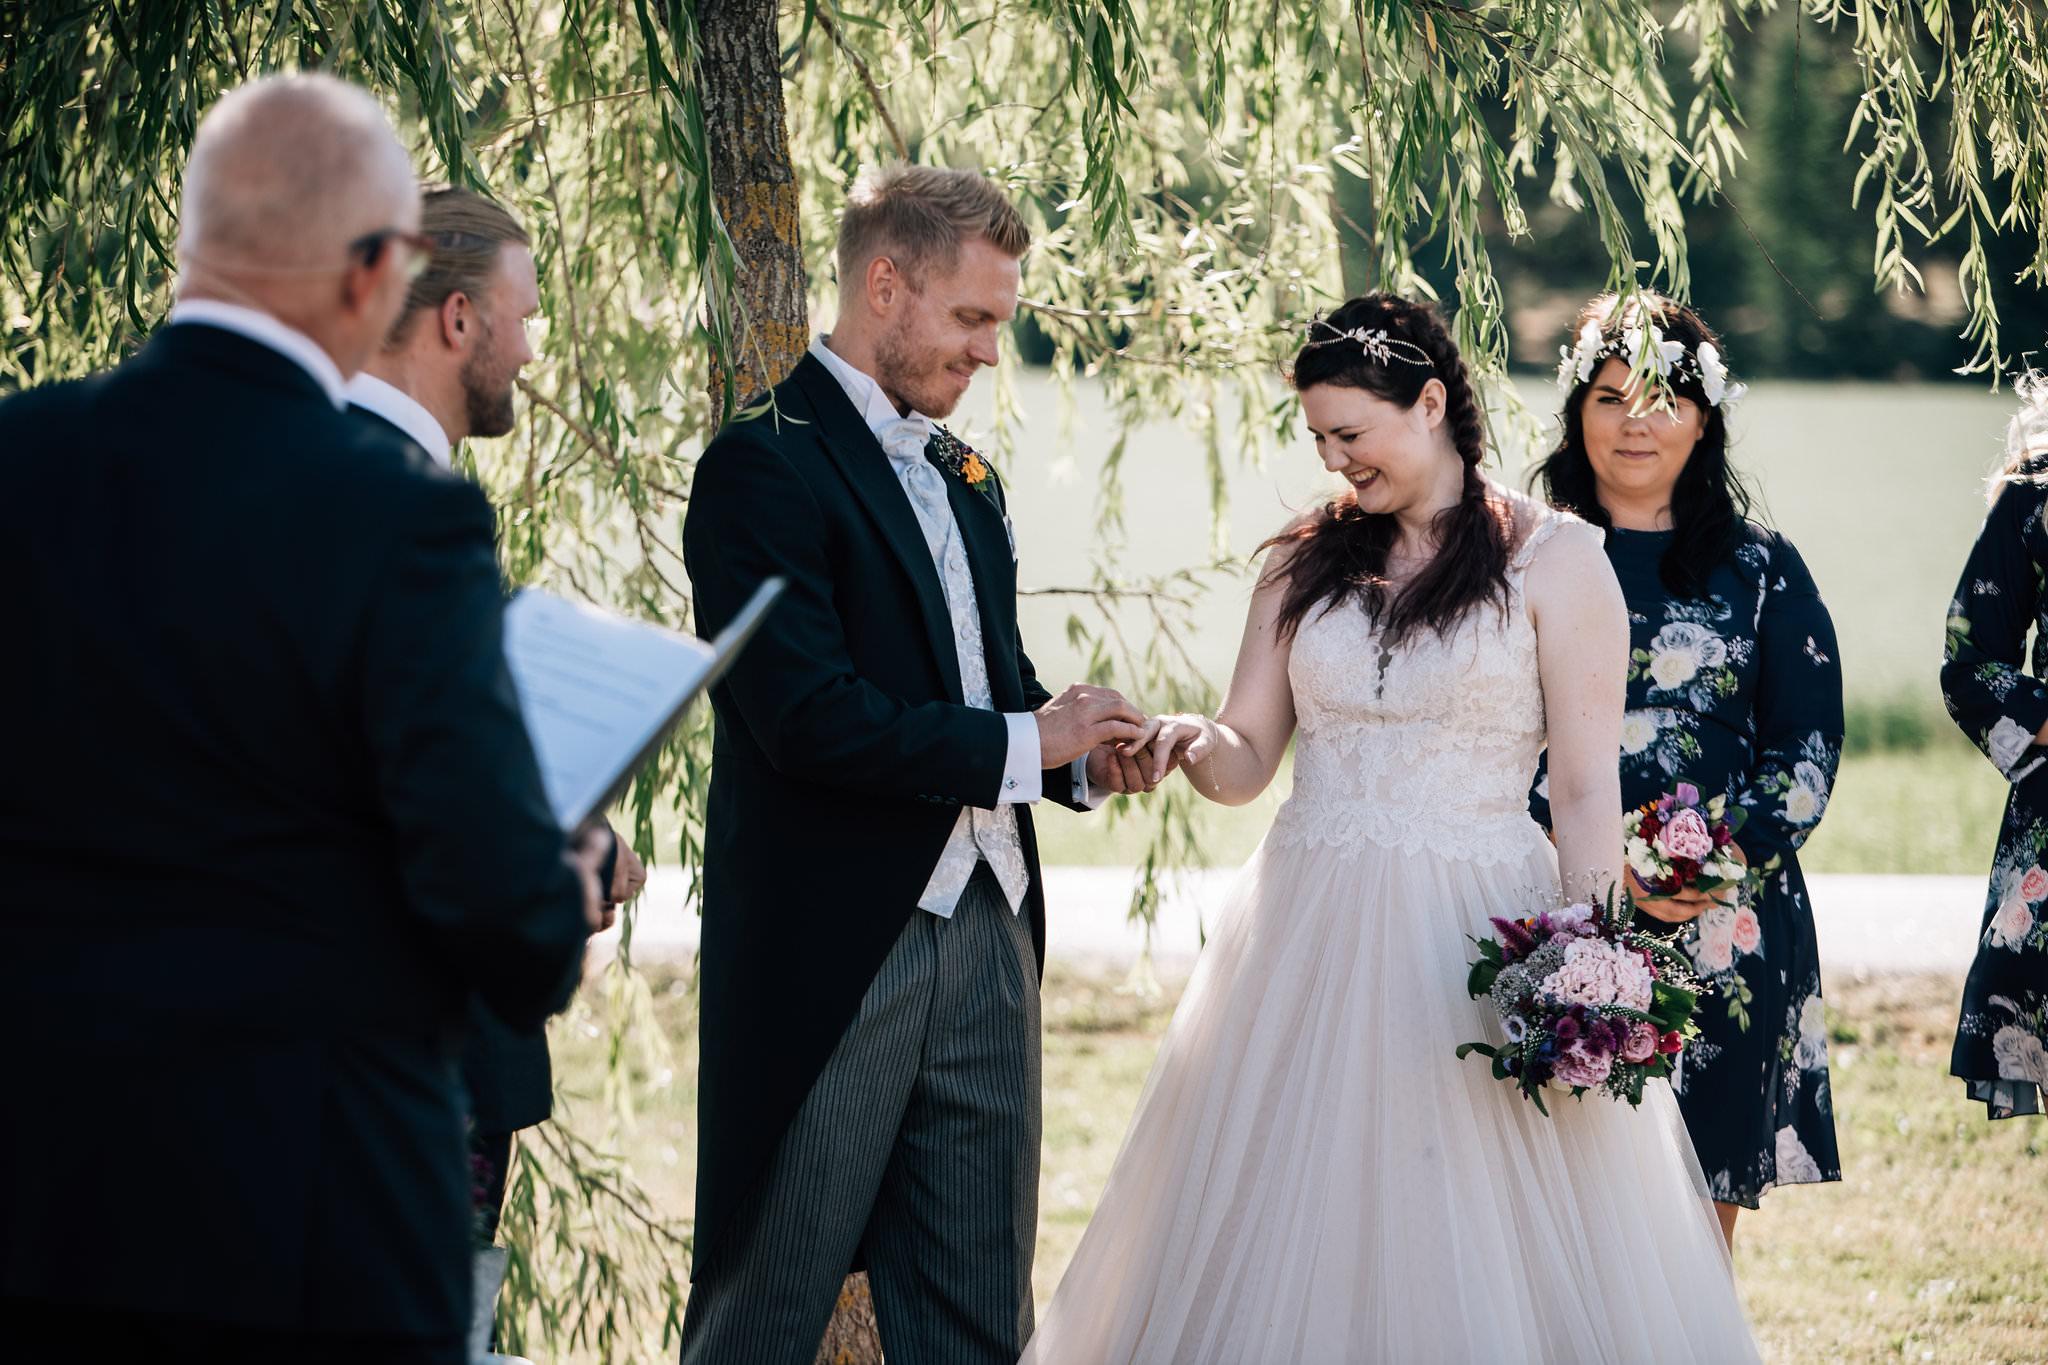 _N850222-fotograf-vestfold-bryllupsfotograf-.jpg